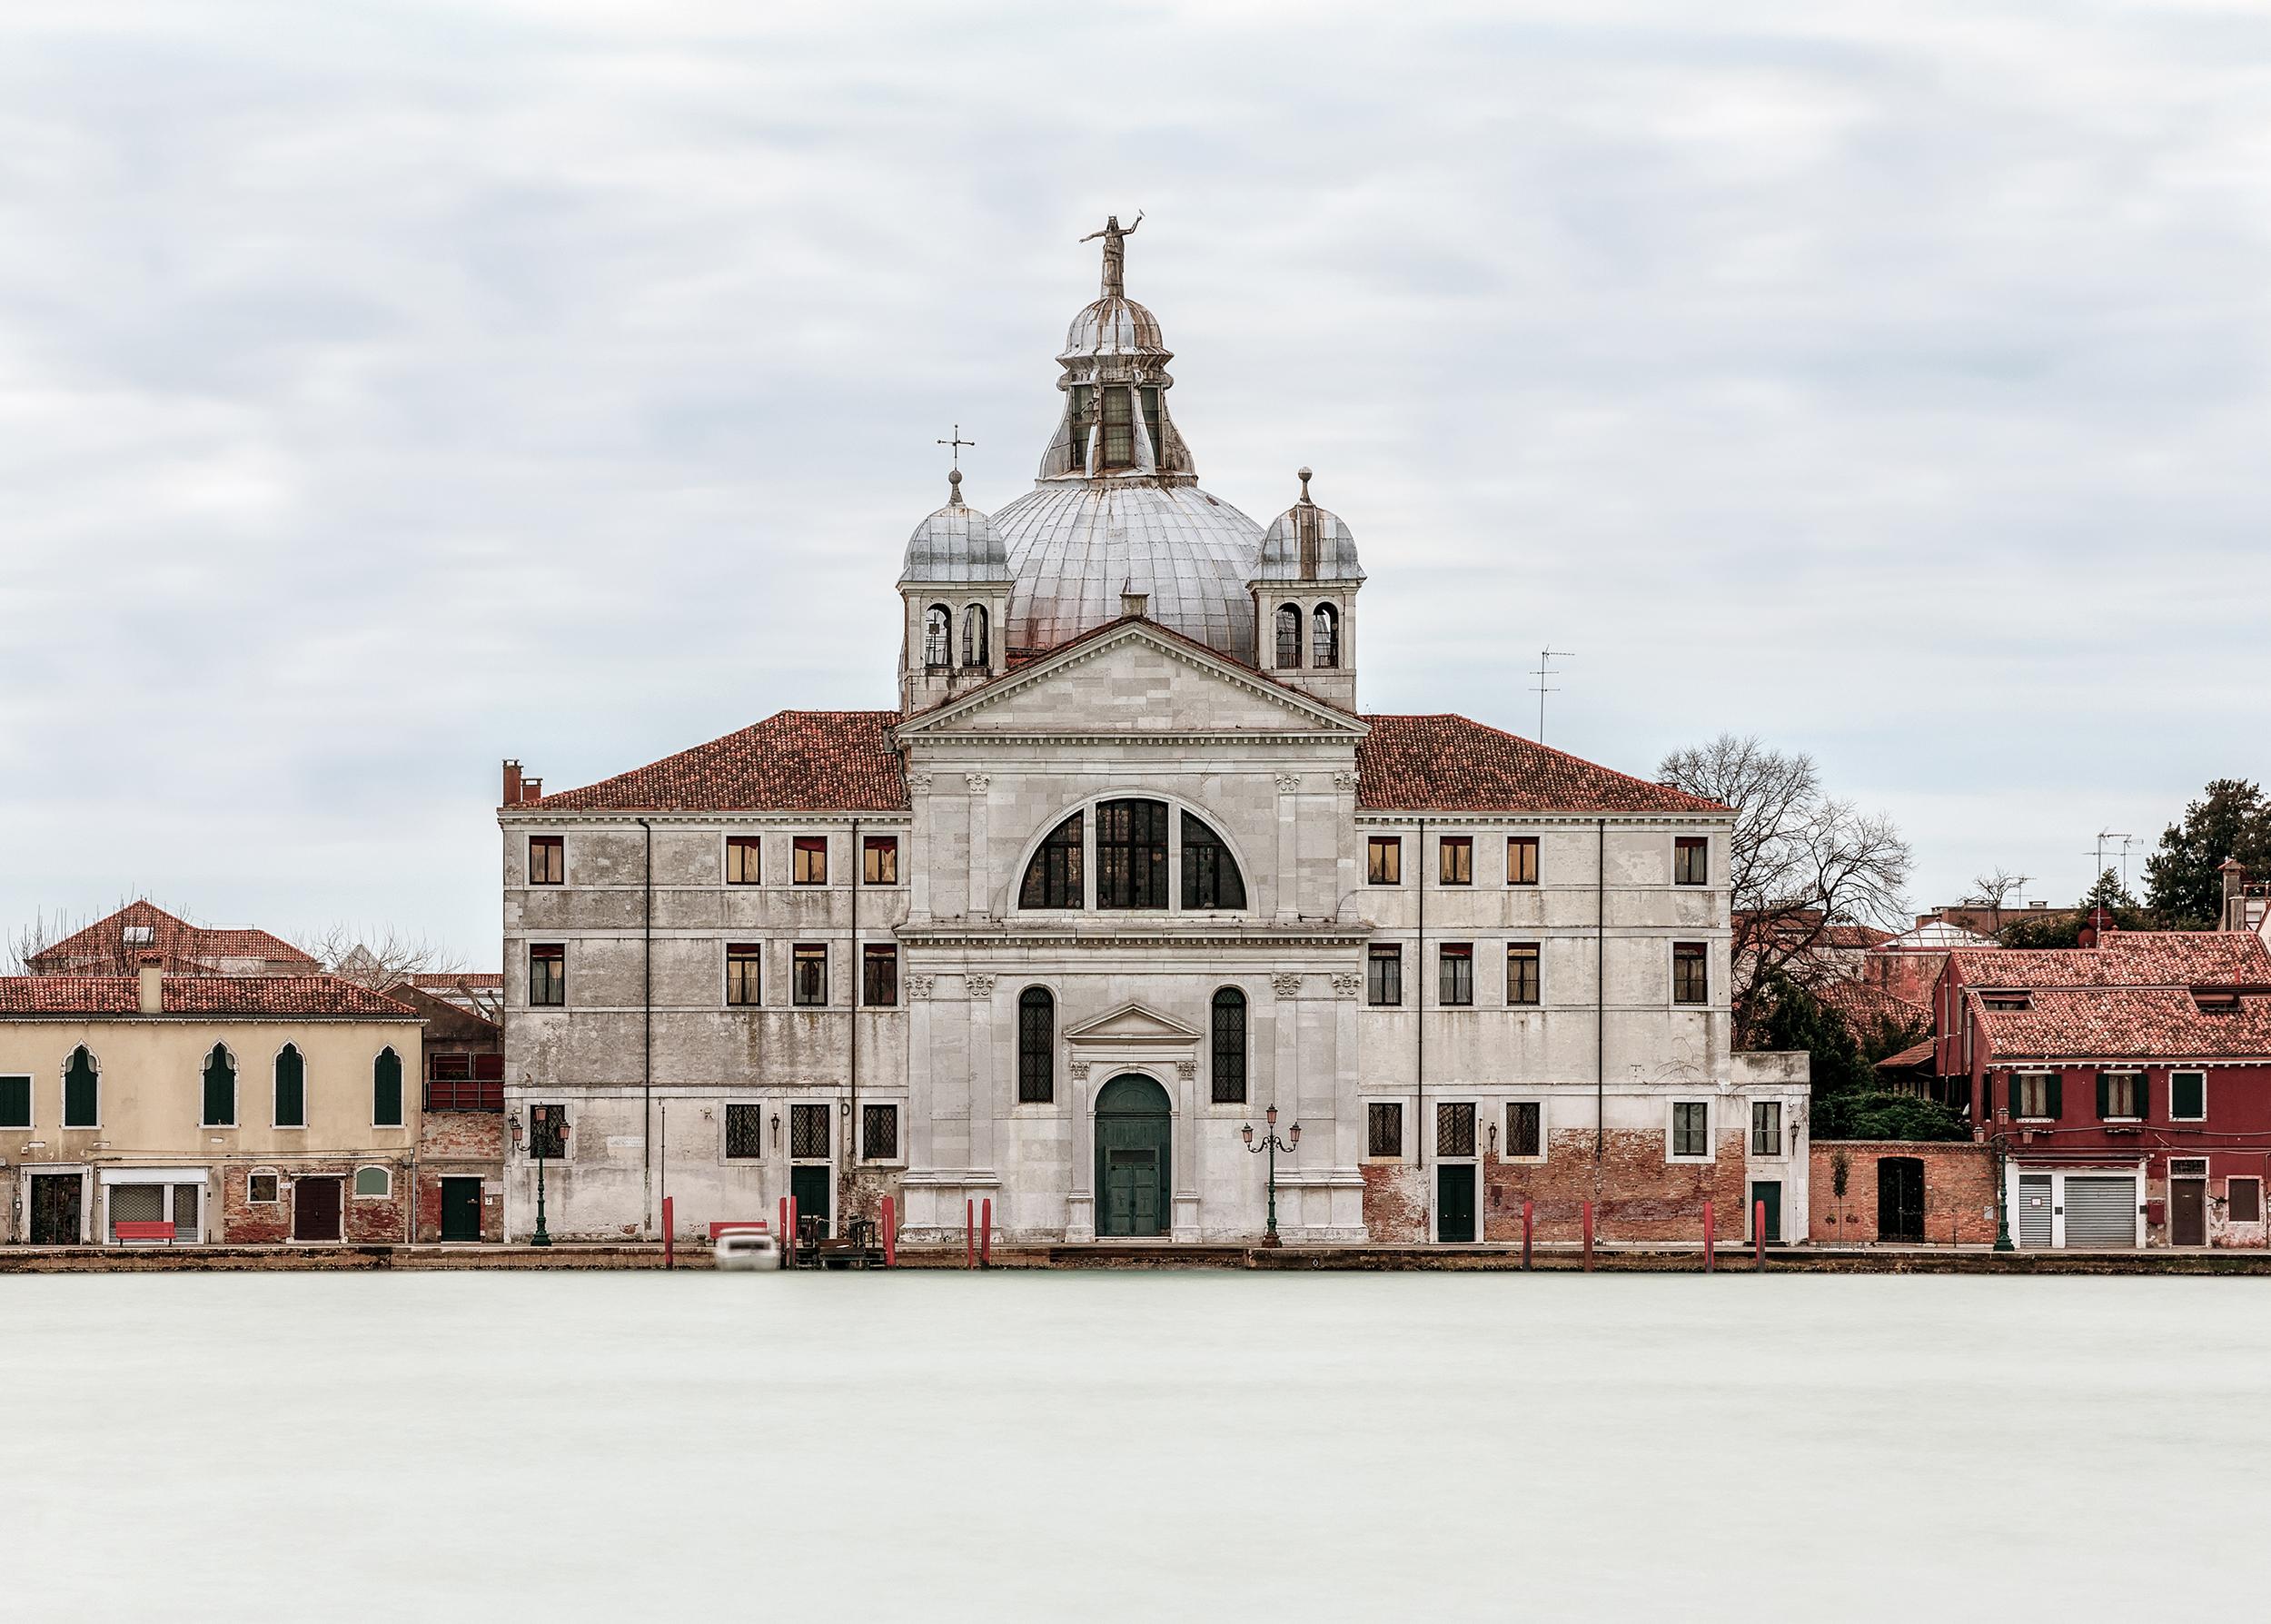 Le Zitelle, Giudecca.